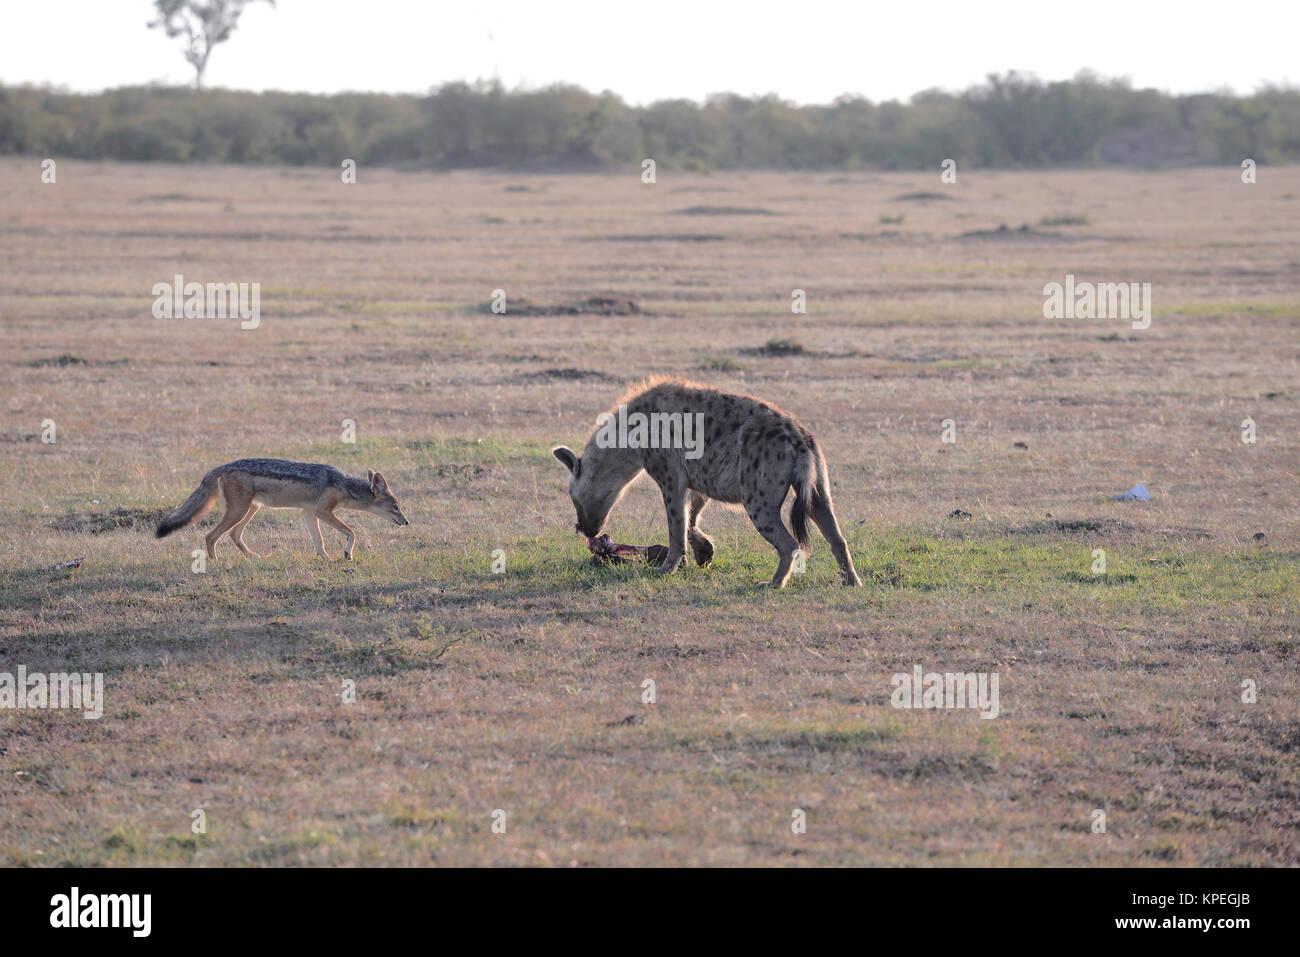 Wildlife in Maasai Mara, Kenya. Hyena and jackal scavenging dead wildebeest. - Stock Image